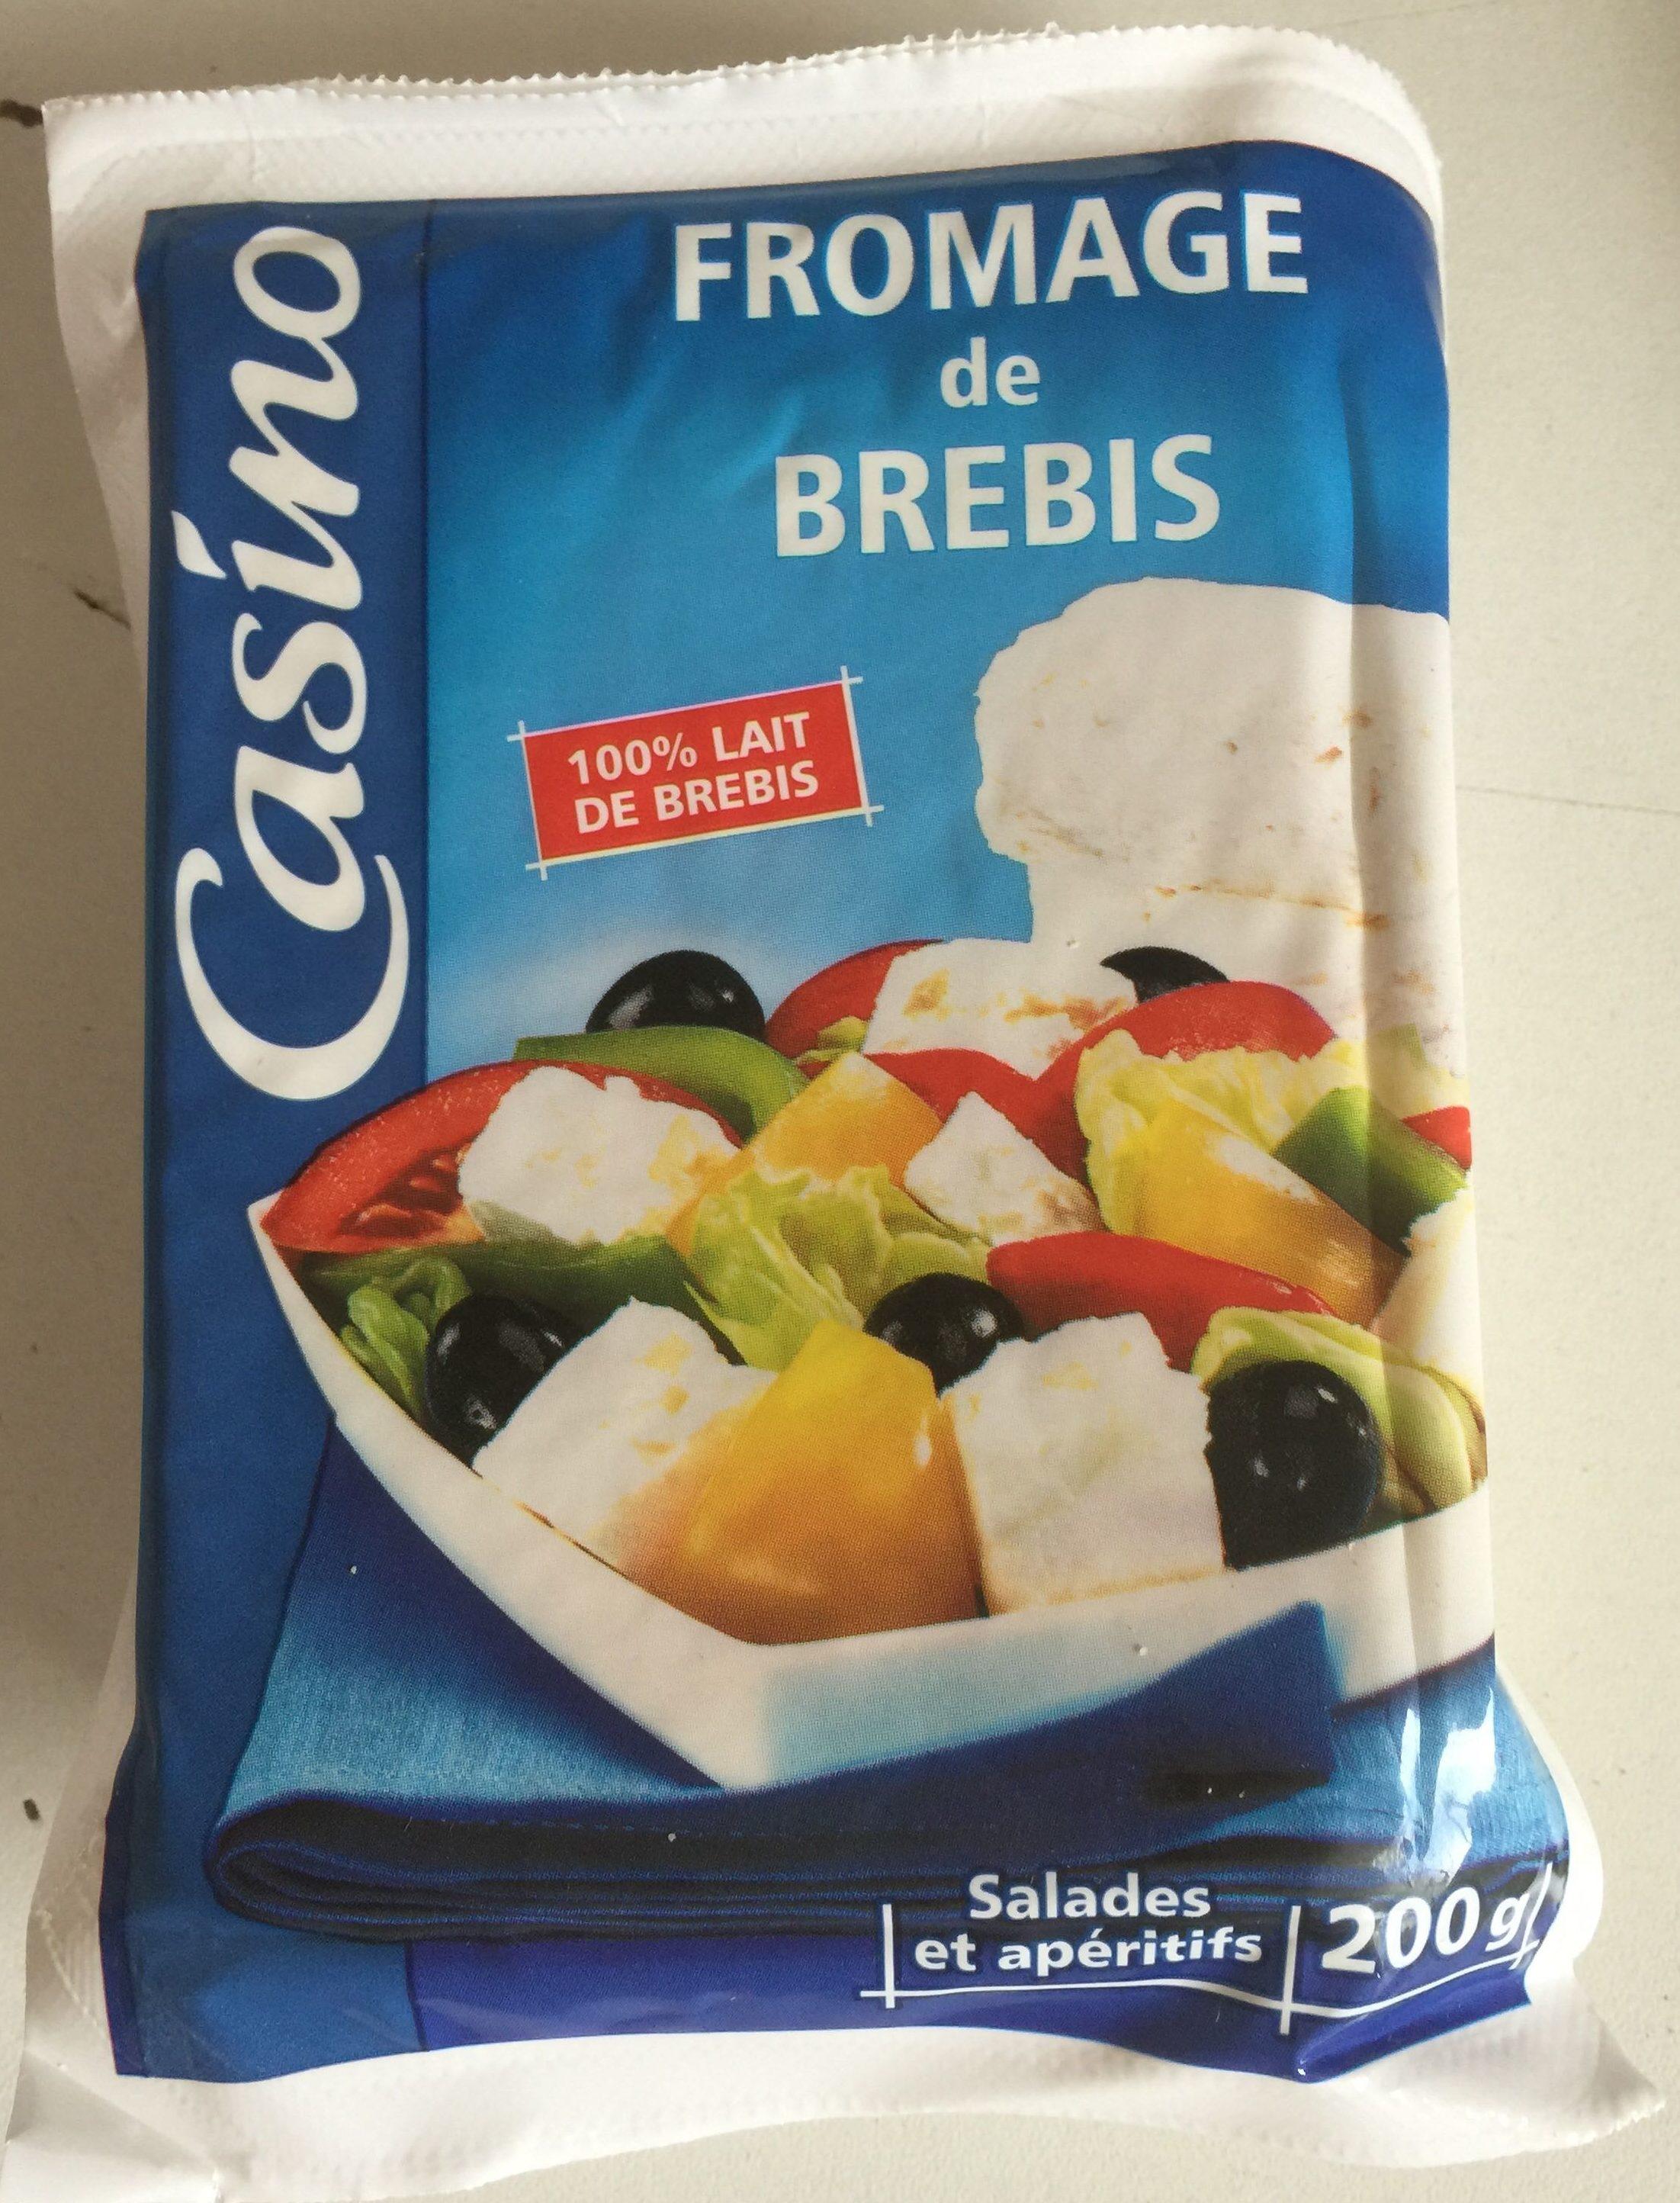 Fromage de brebis - Product